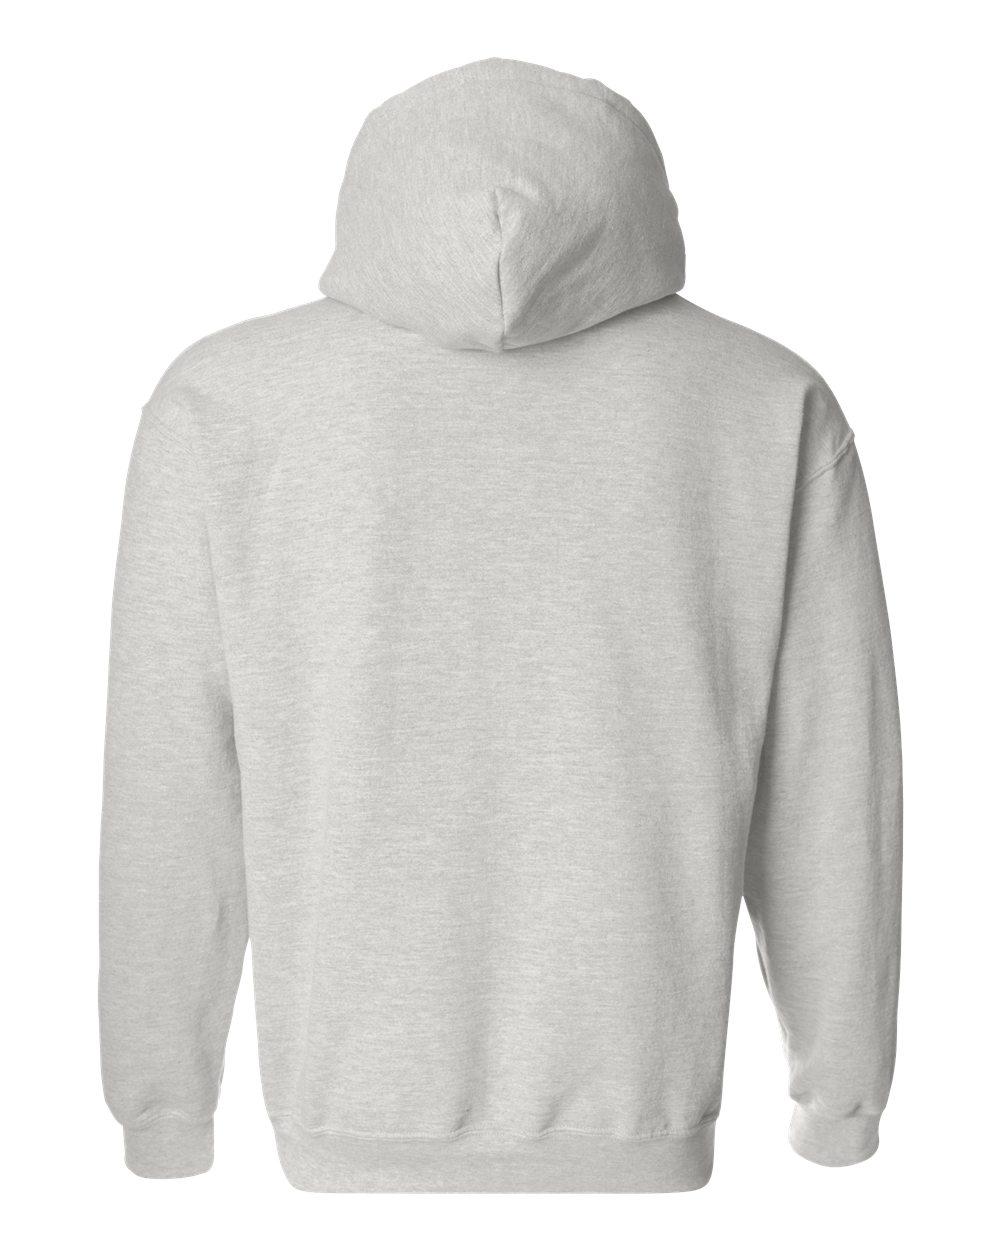 Gildan-Mens-Blank-Hoodie-Heavy-Blend-Hooded-Sweatshirt-18500-up-to-5XL thumbnail 13